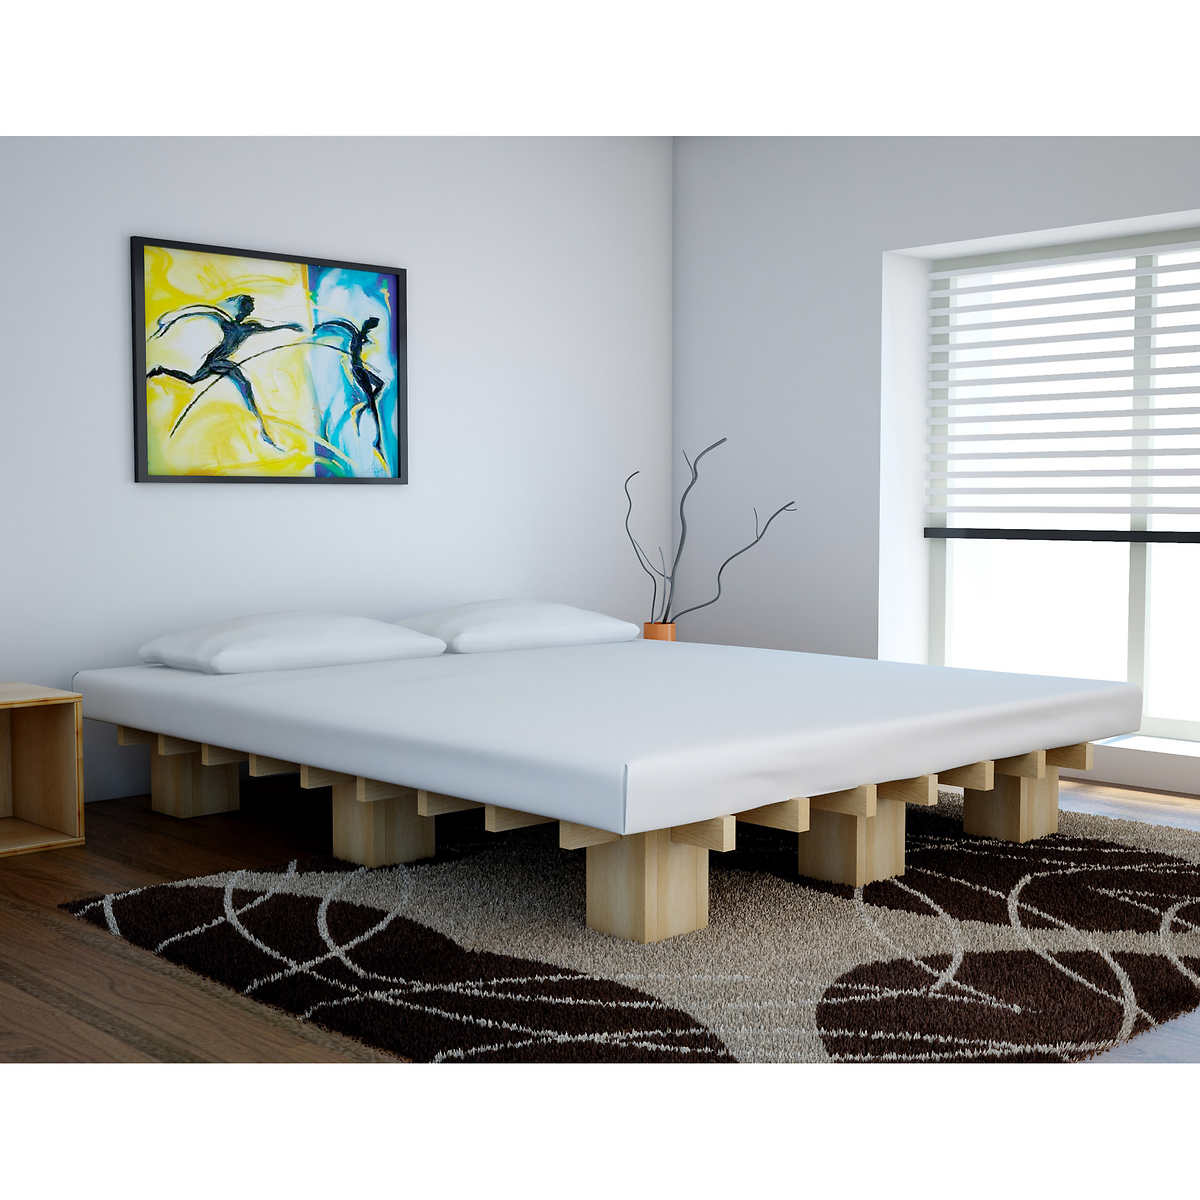 tictactoe double platform beds -  double platform beds item  click to zoom